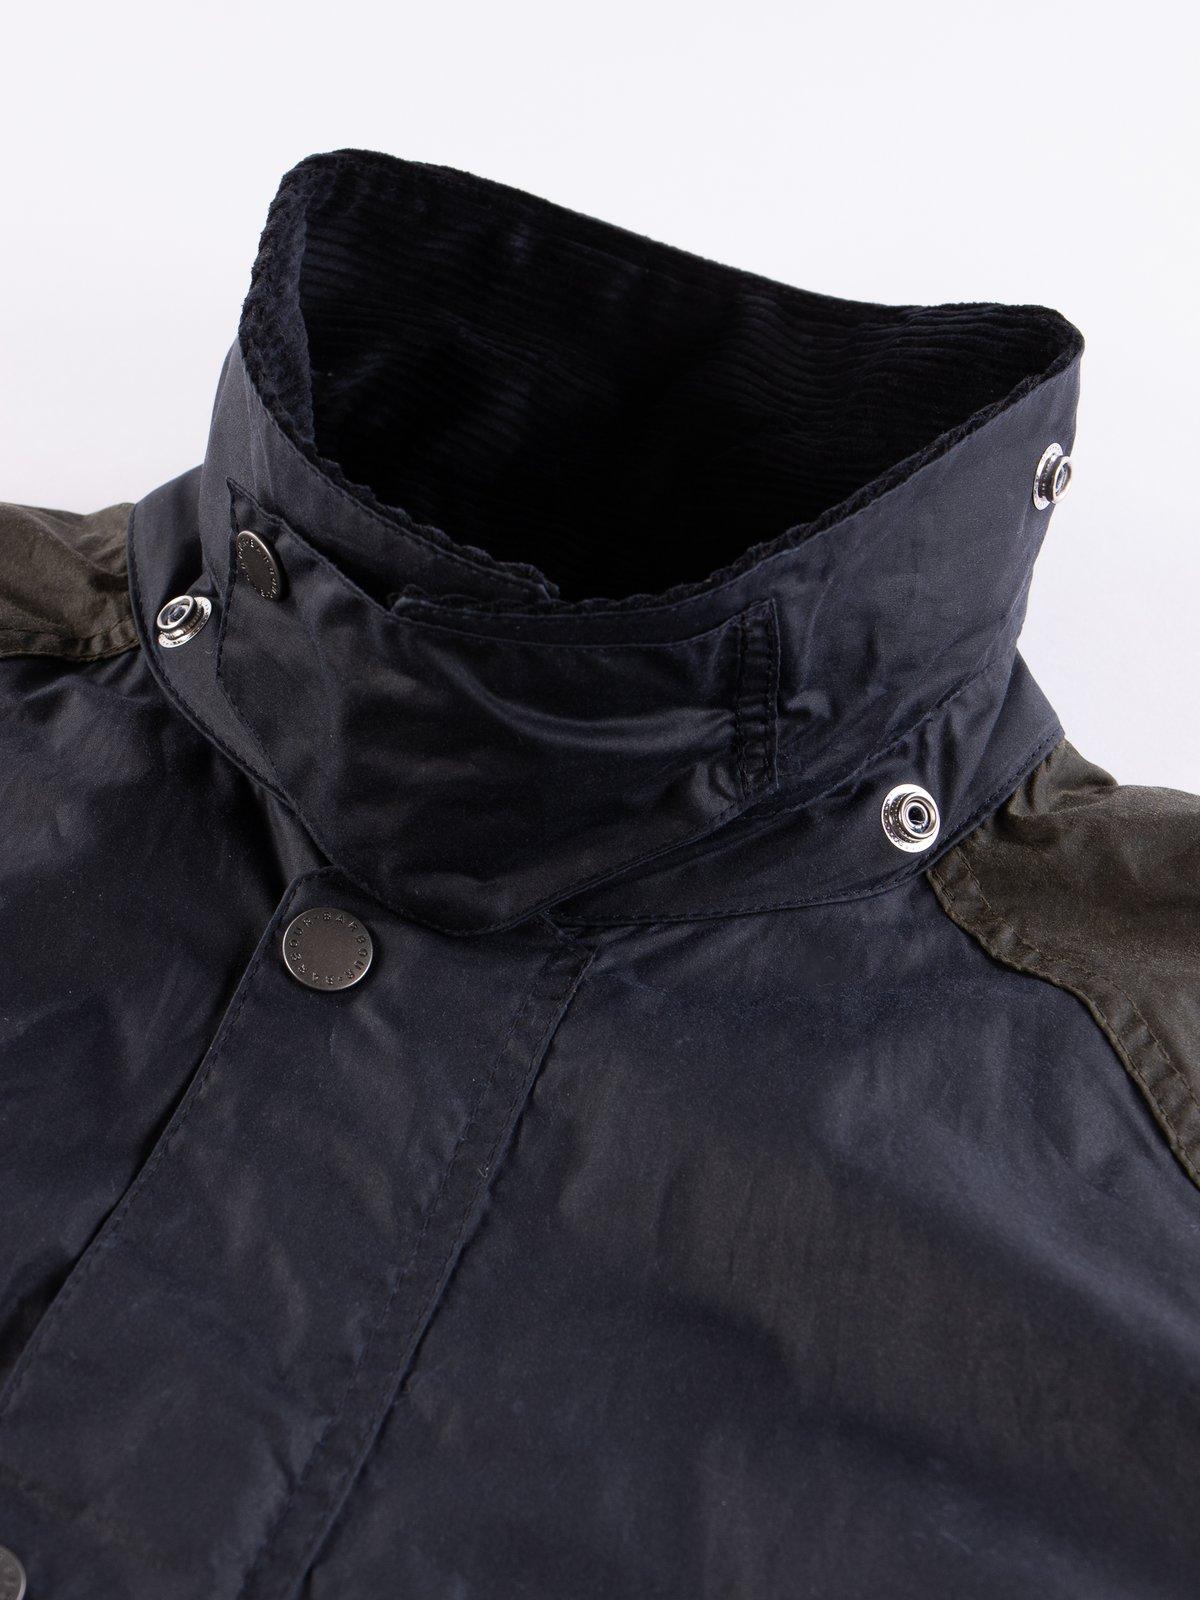 Multi Pitt Wax Jacket - Image 6